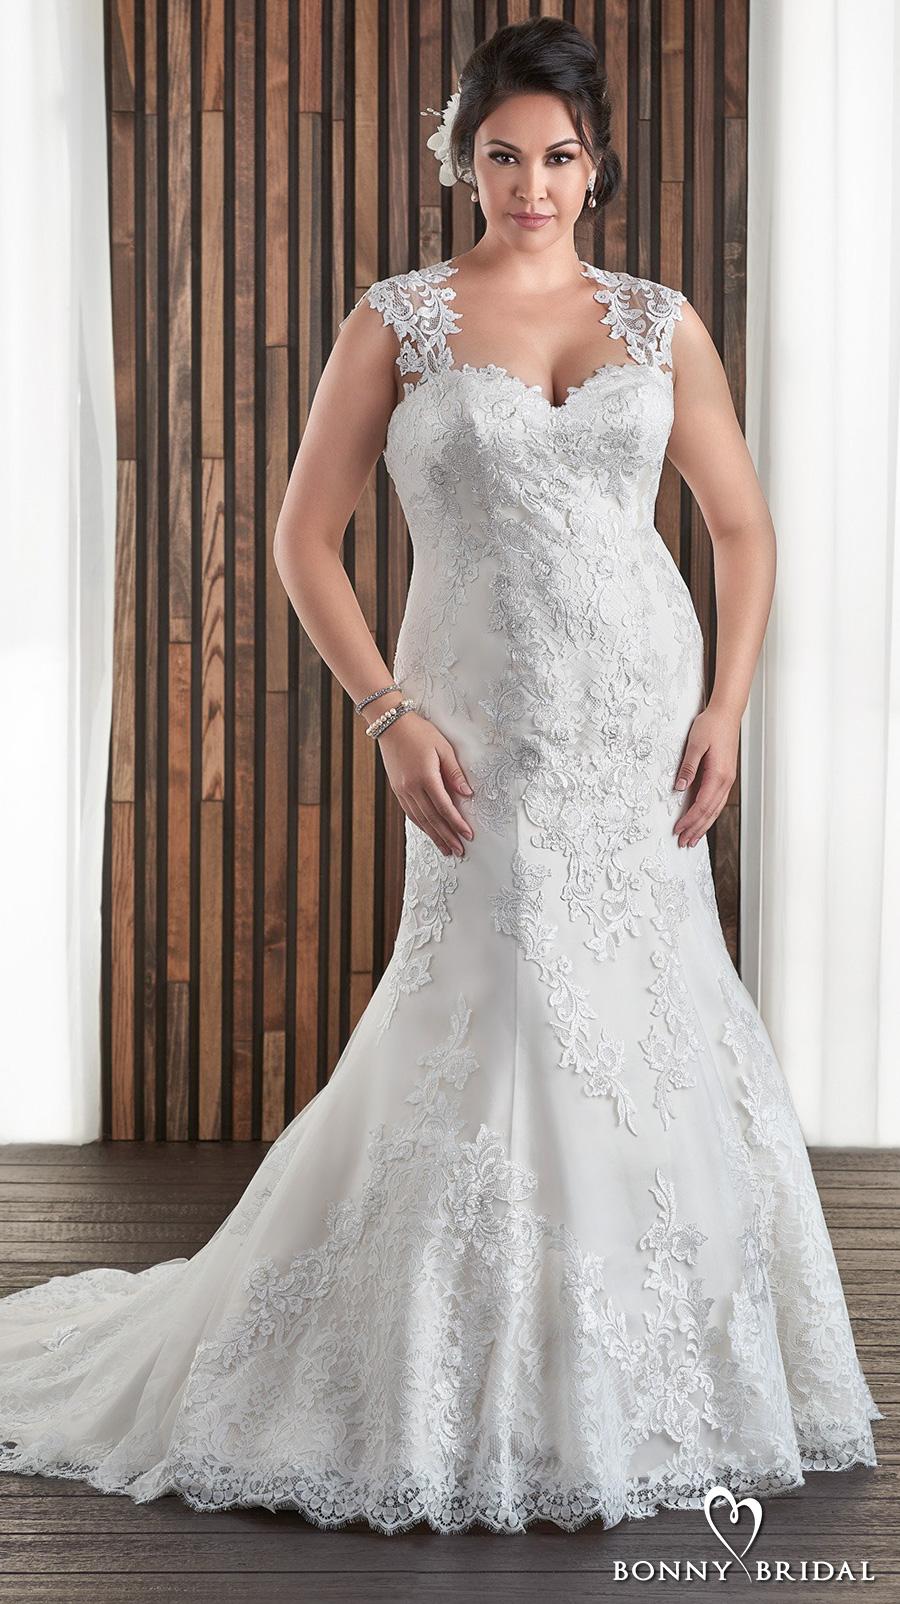 Bonny Bridal Wedding Dresses — Unforgettable Styles for ...